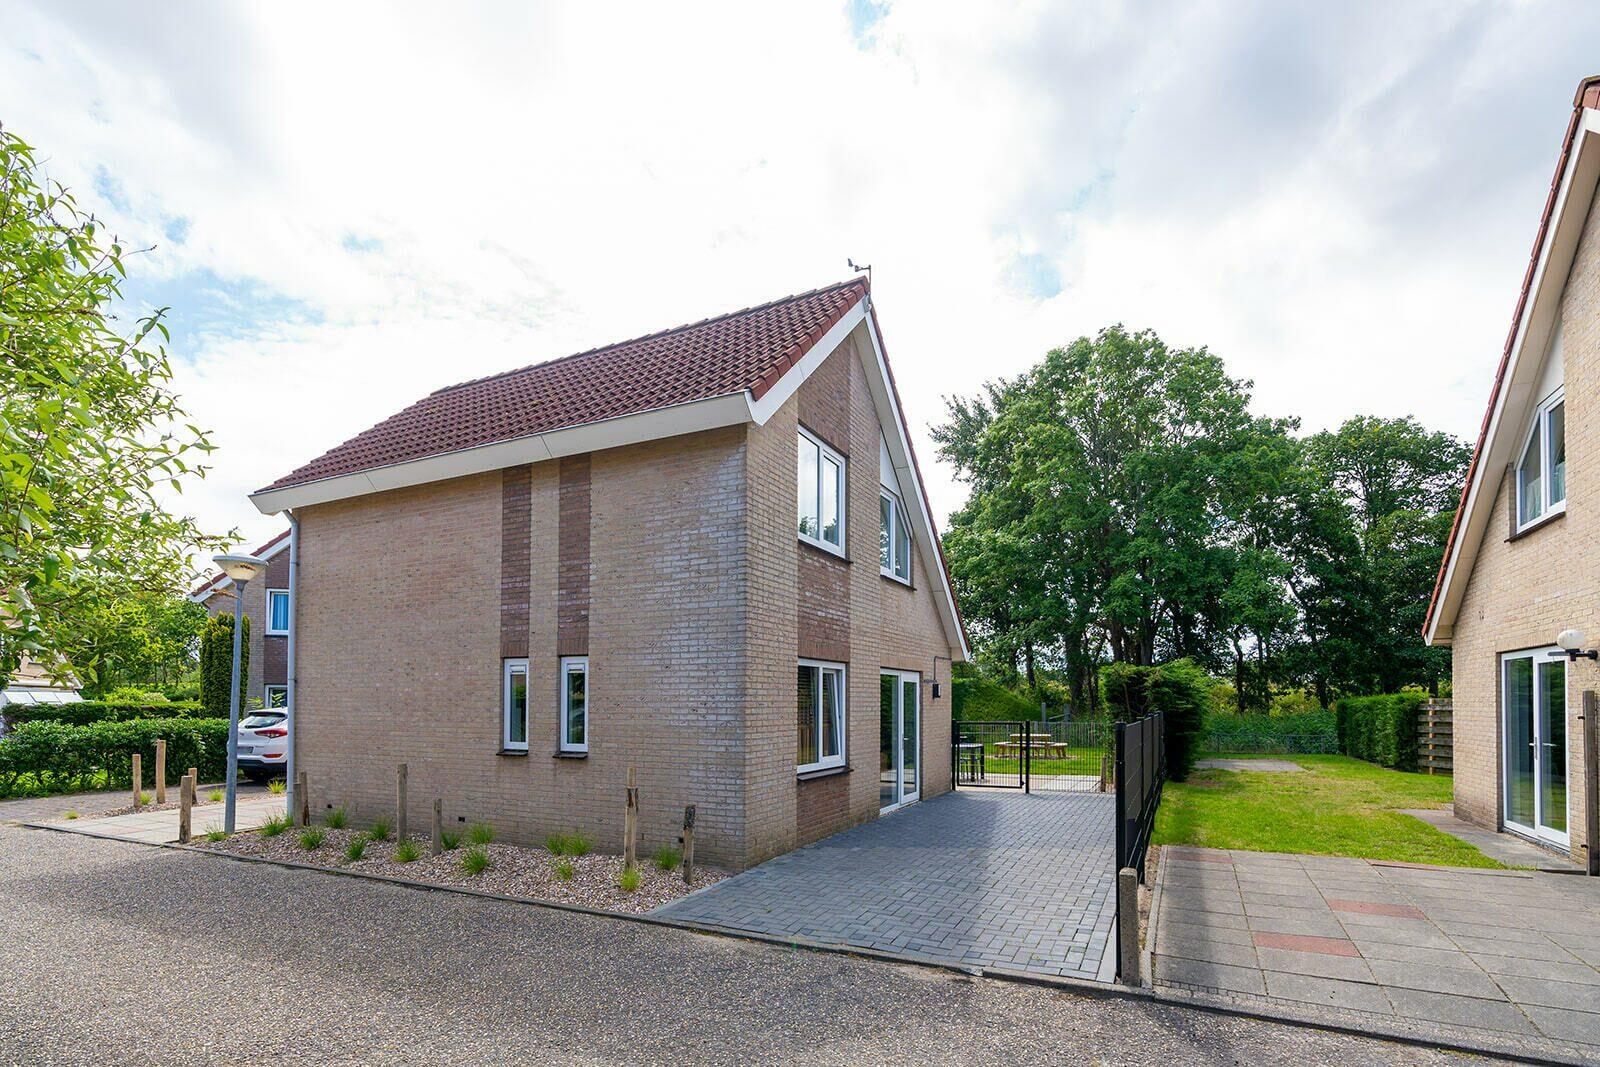 Mosselbank 81 - Noordzeepark Ouddorp